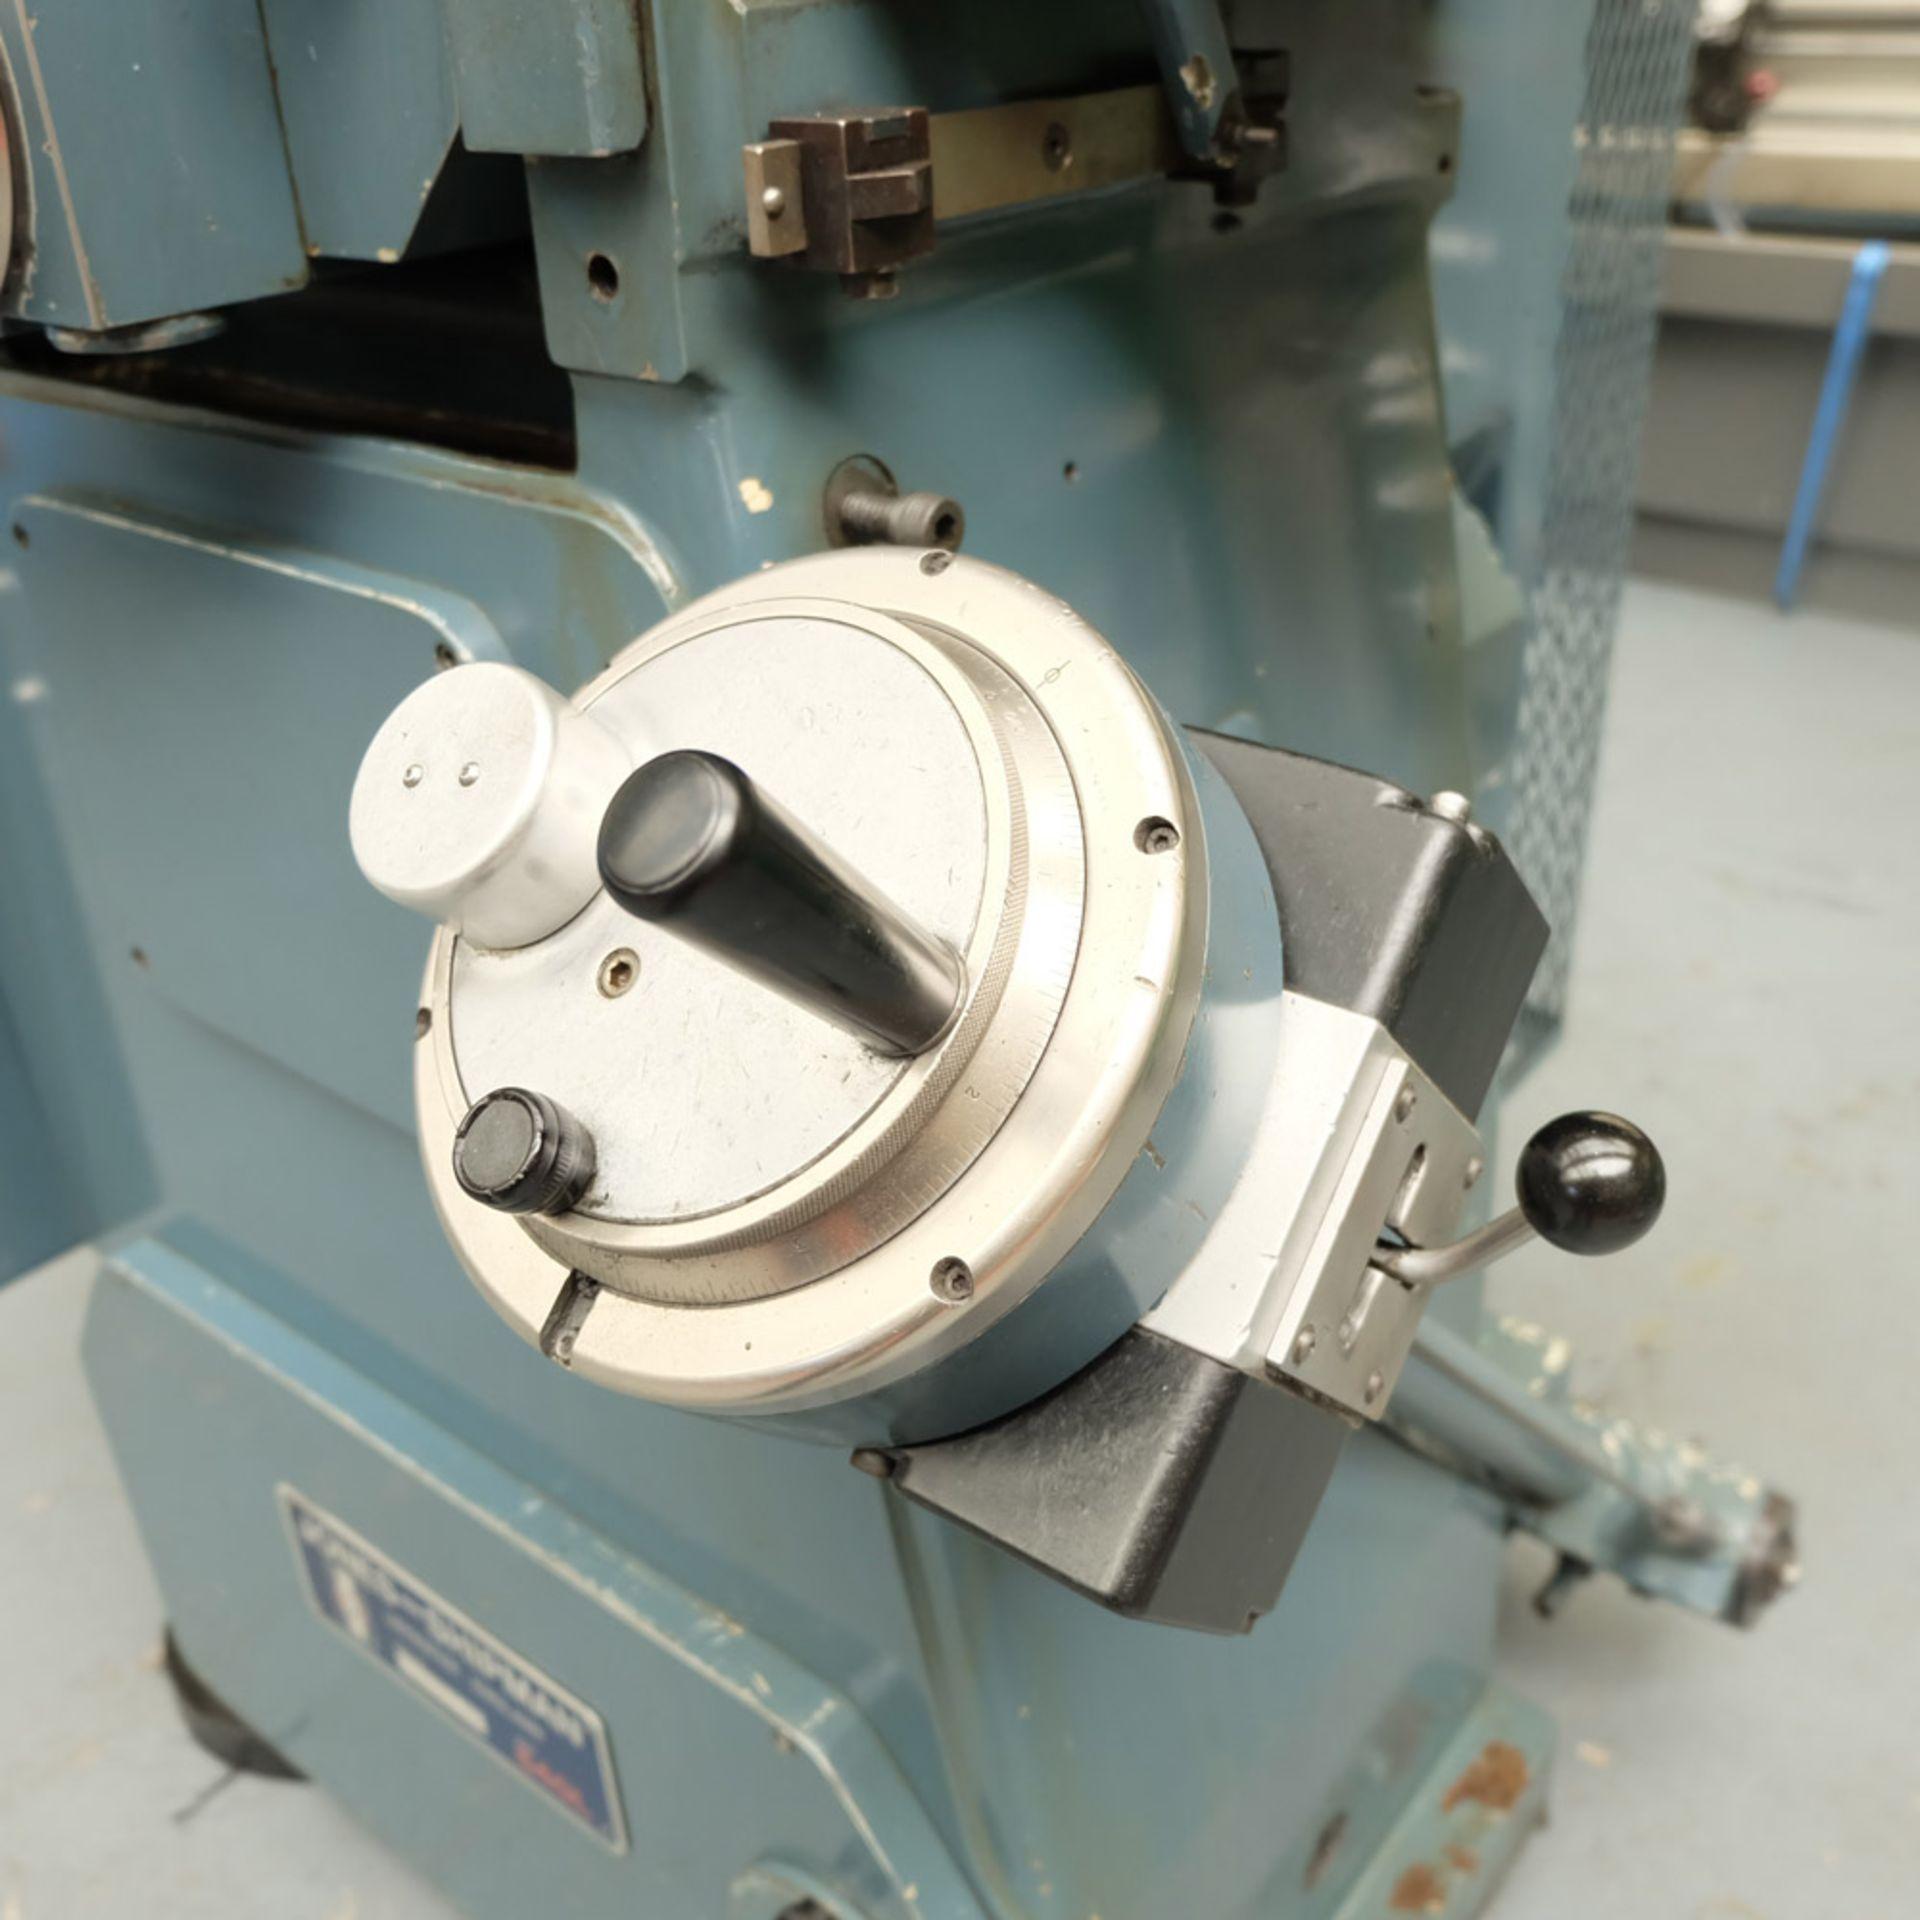 "Jones & Shipman 540L Tool Room Surface Grinder. Capacity 18"" x 6"". - Image 4 of 6"